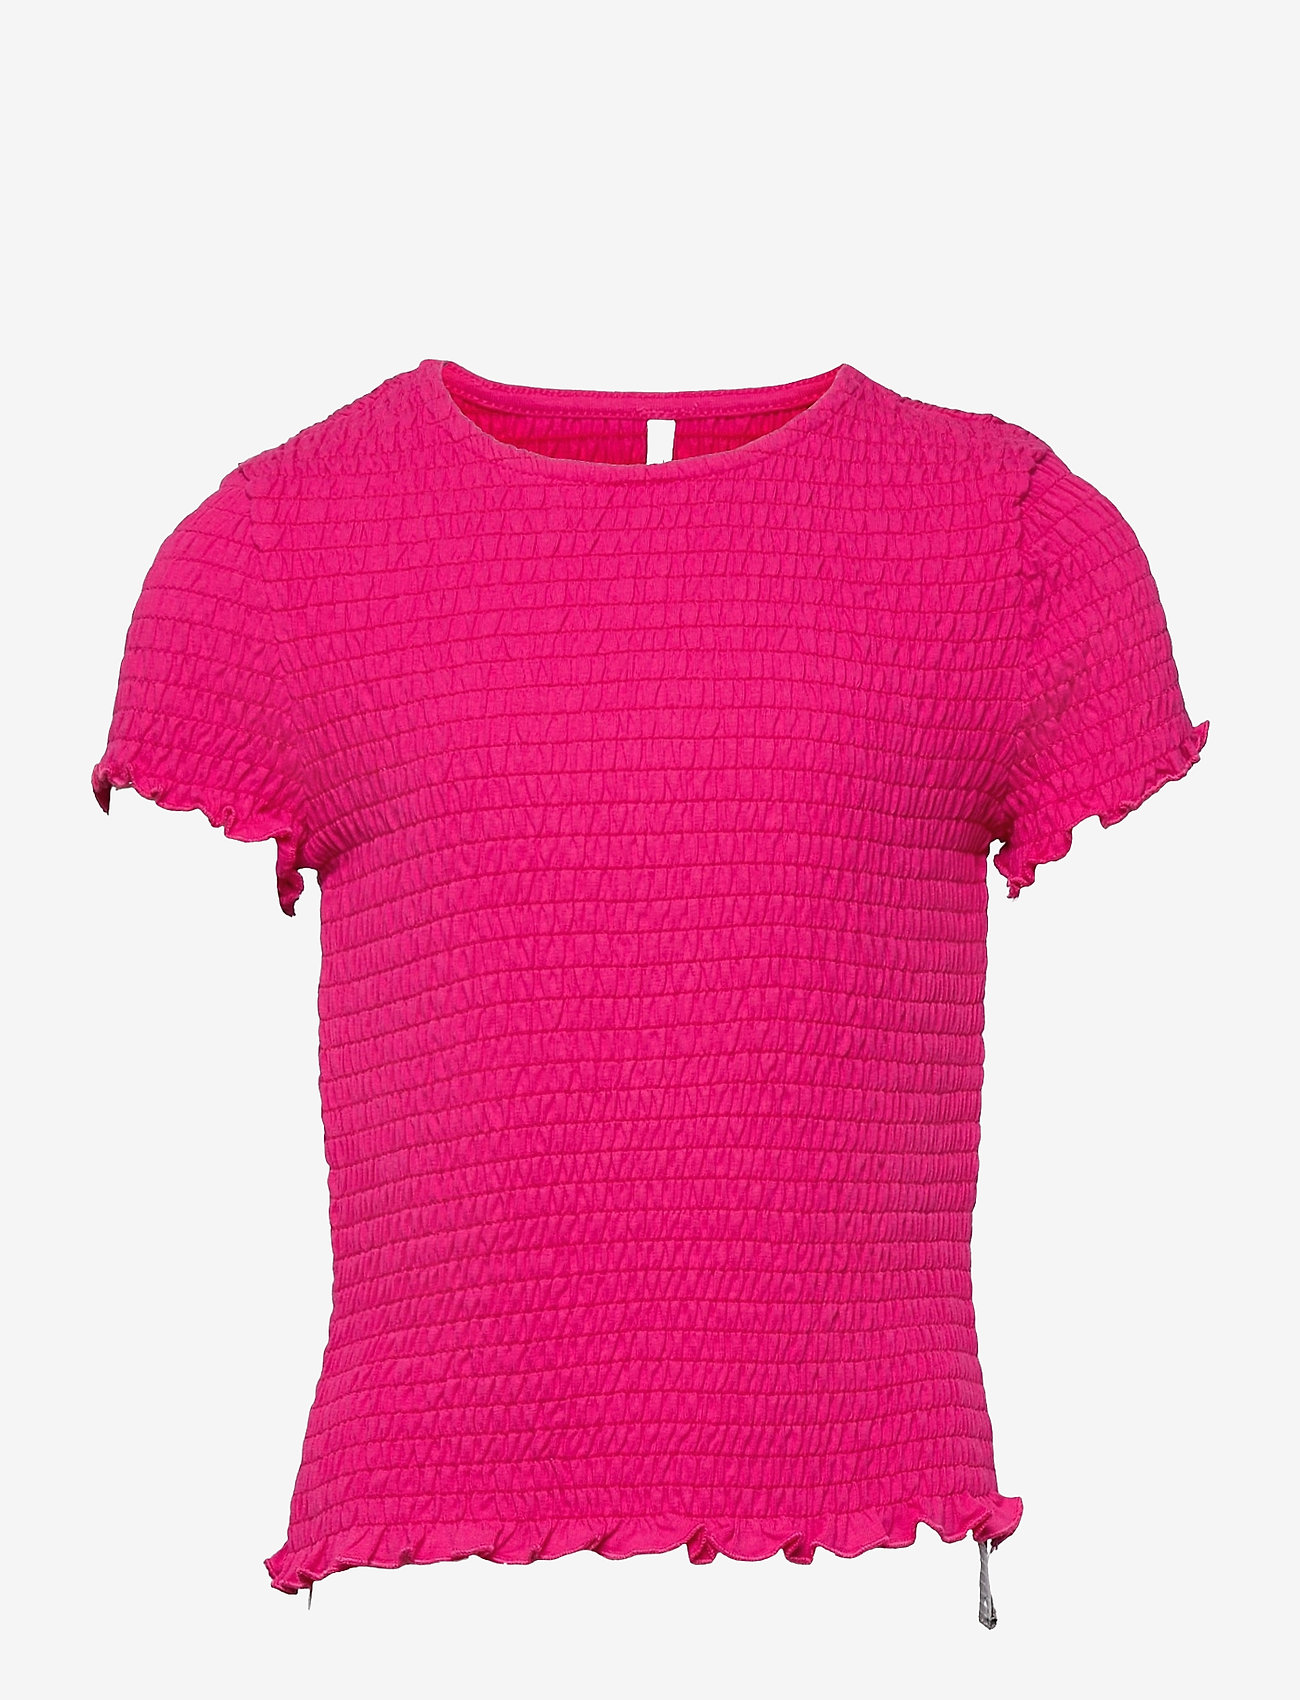 Kids Only - KONDELI LIFE S/S SMOCK TOP JRS - t-shirts - beetroot purple - 0